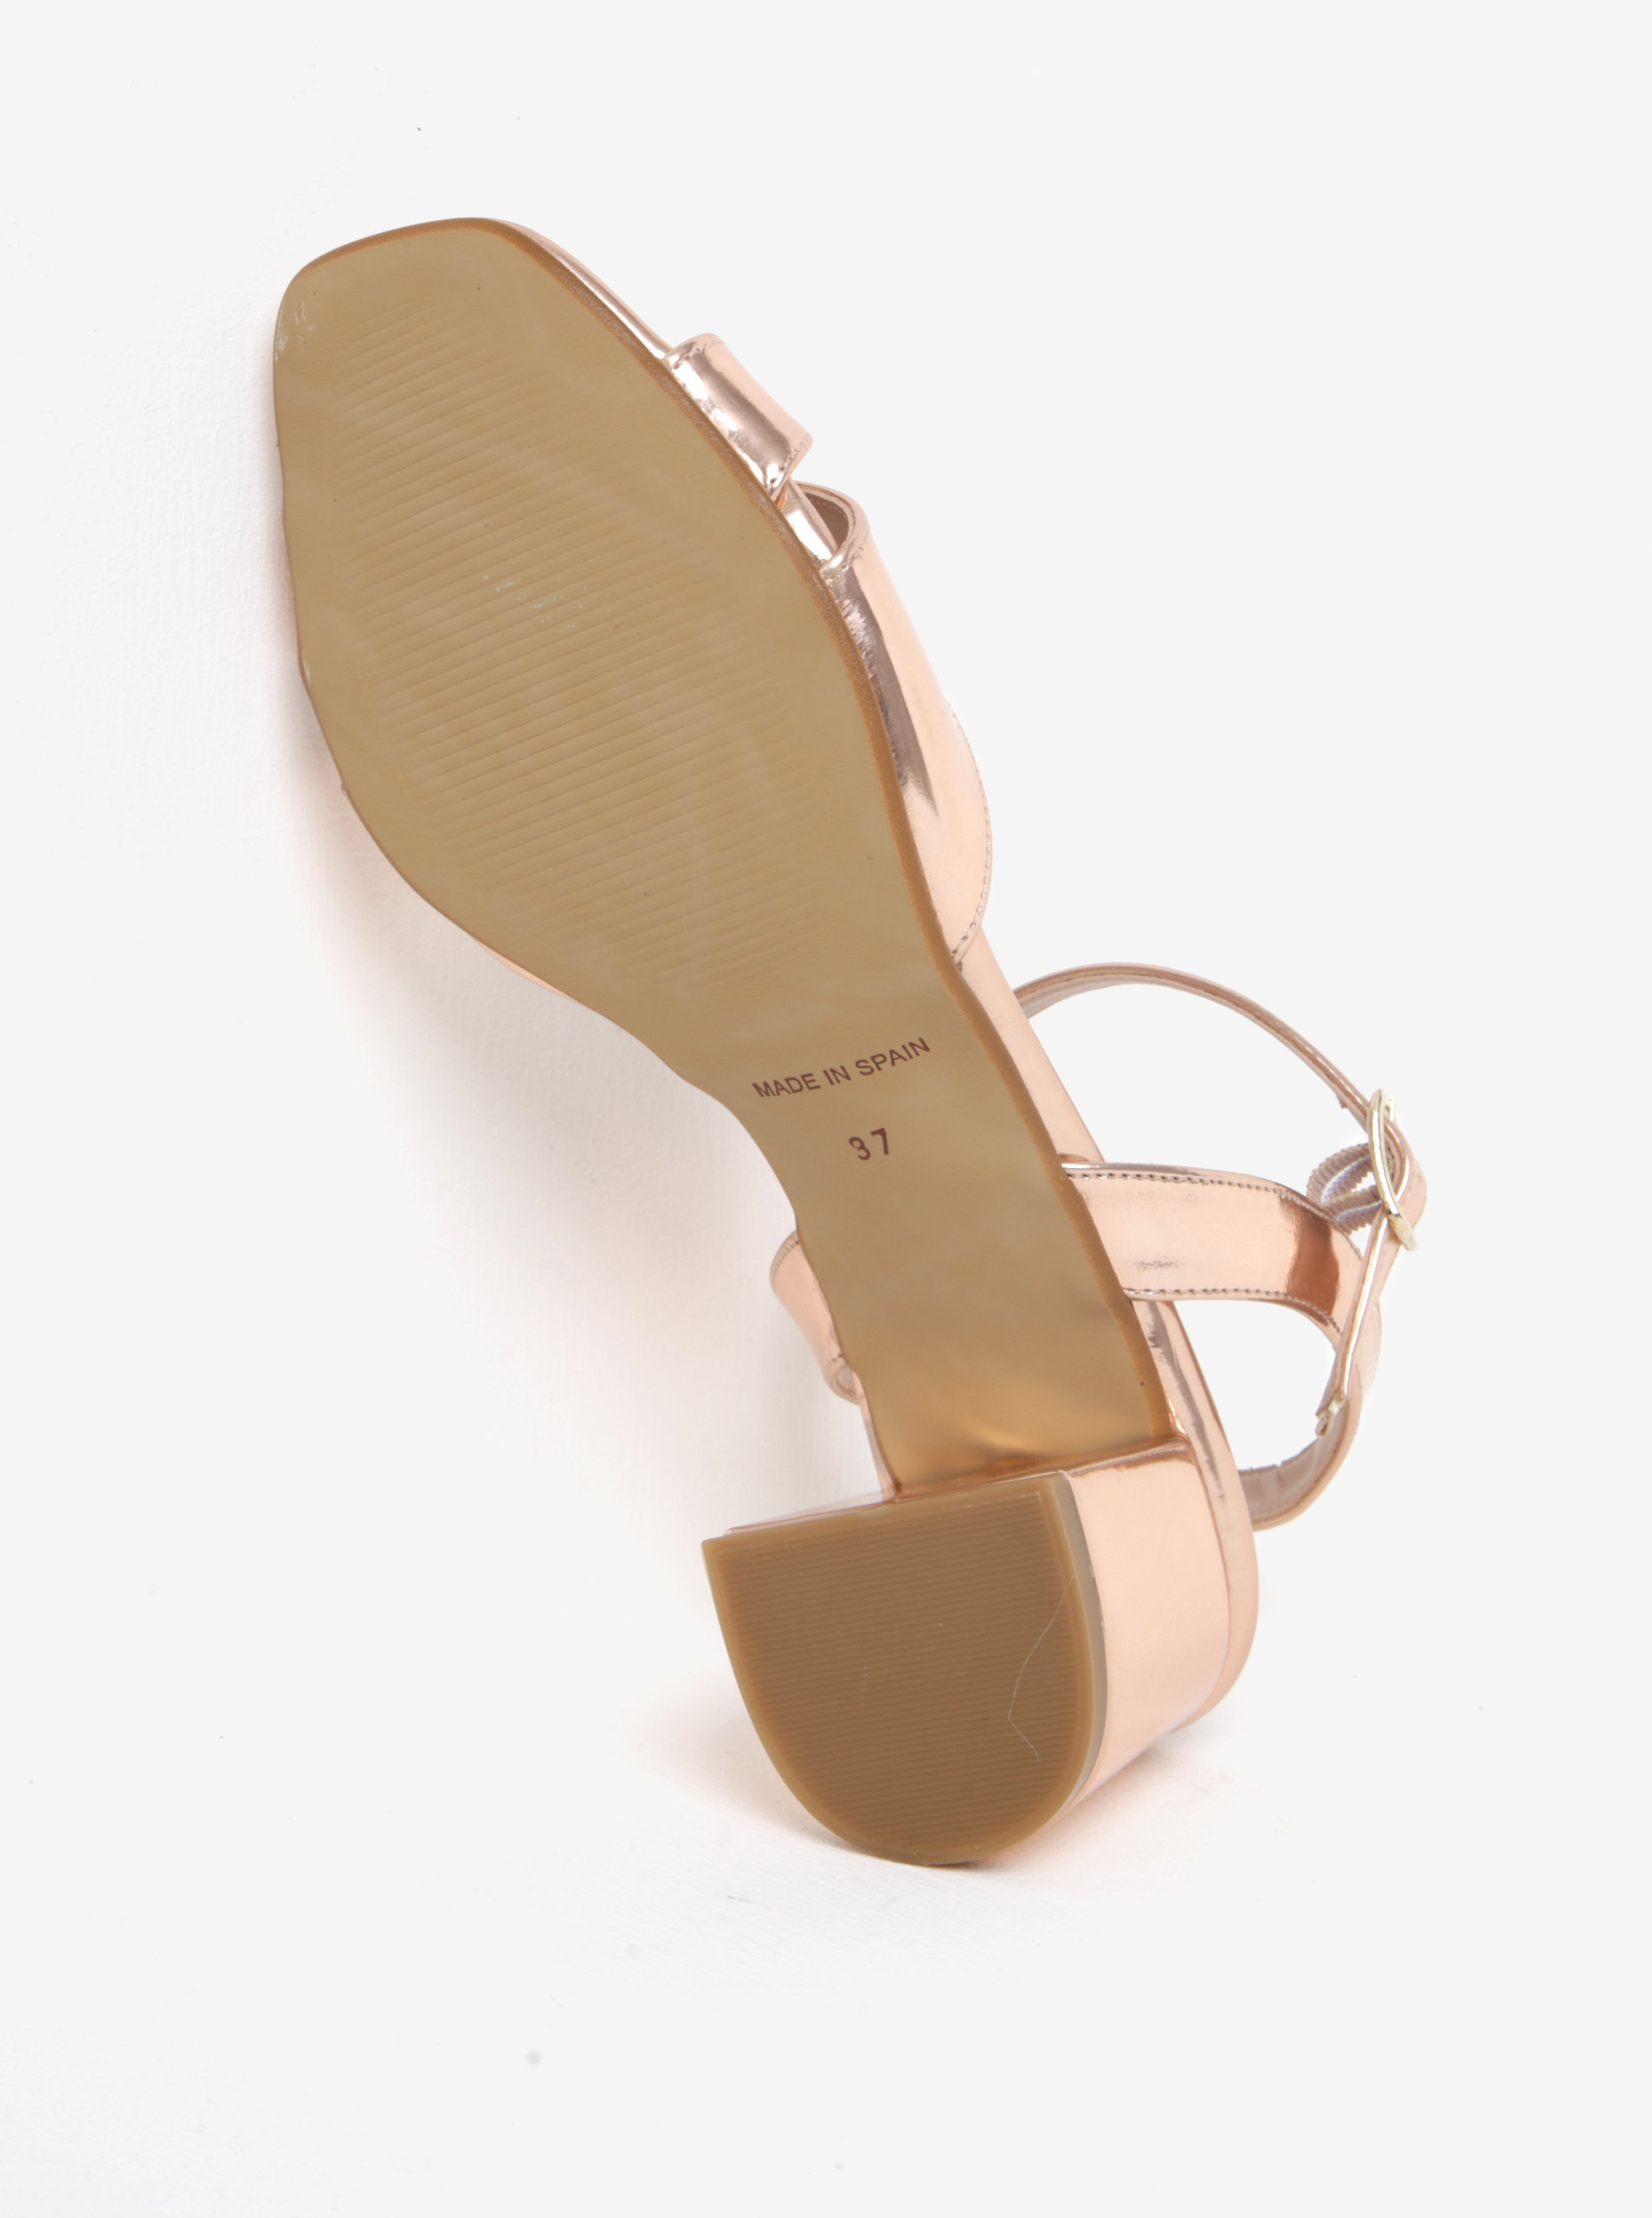 07b0c7370c Lesklé sandále v ružovozlatej farbe na širokom podpätku OJJU ...